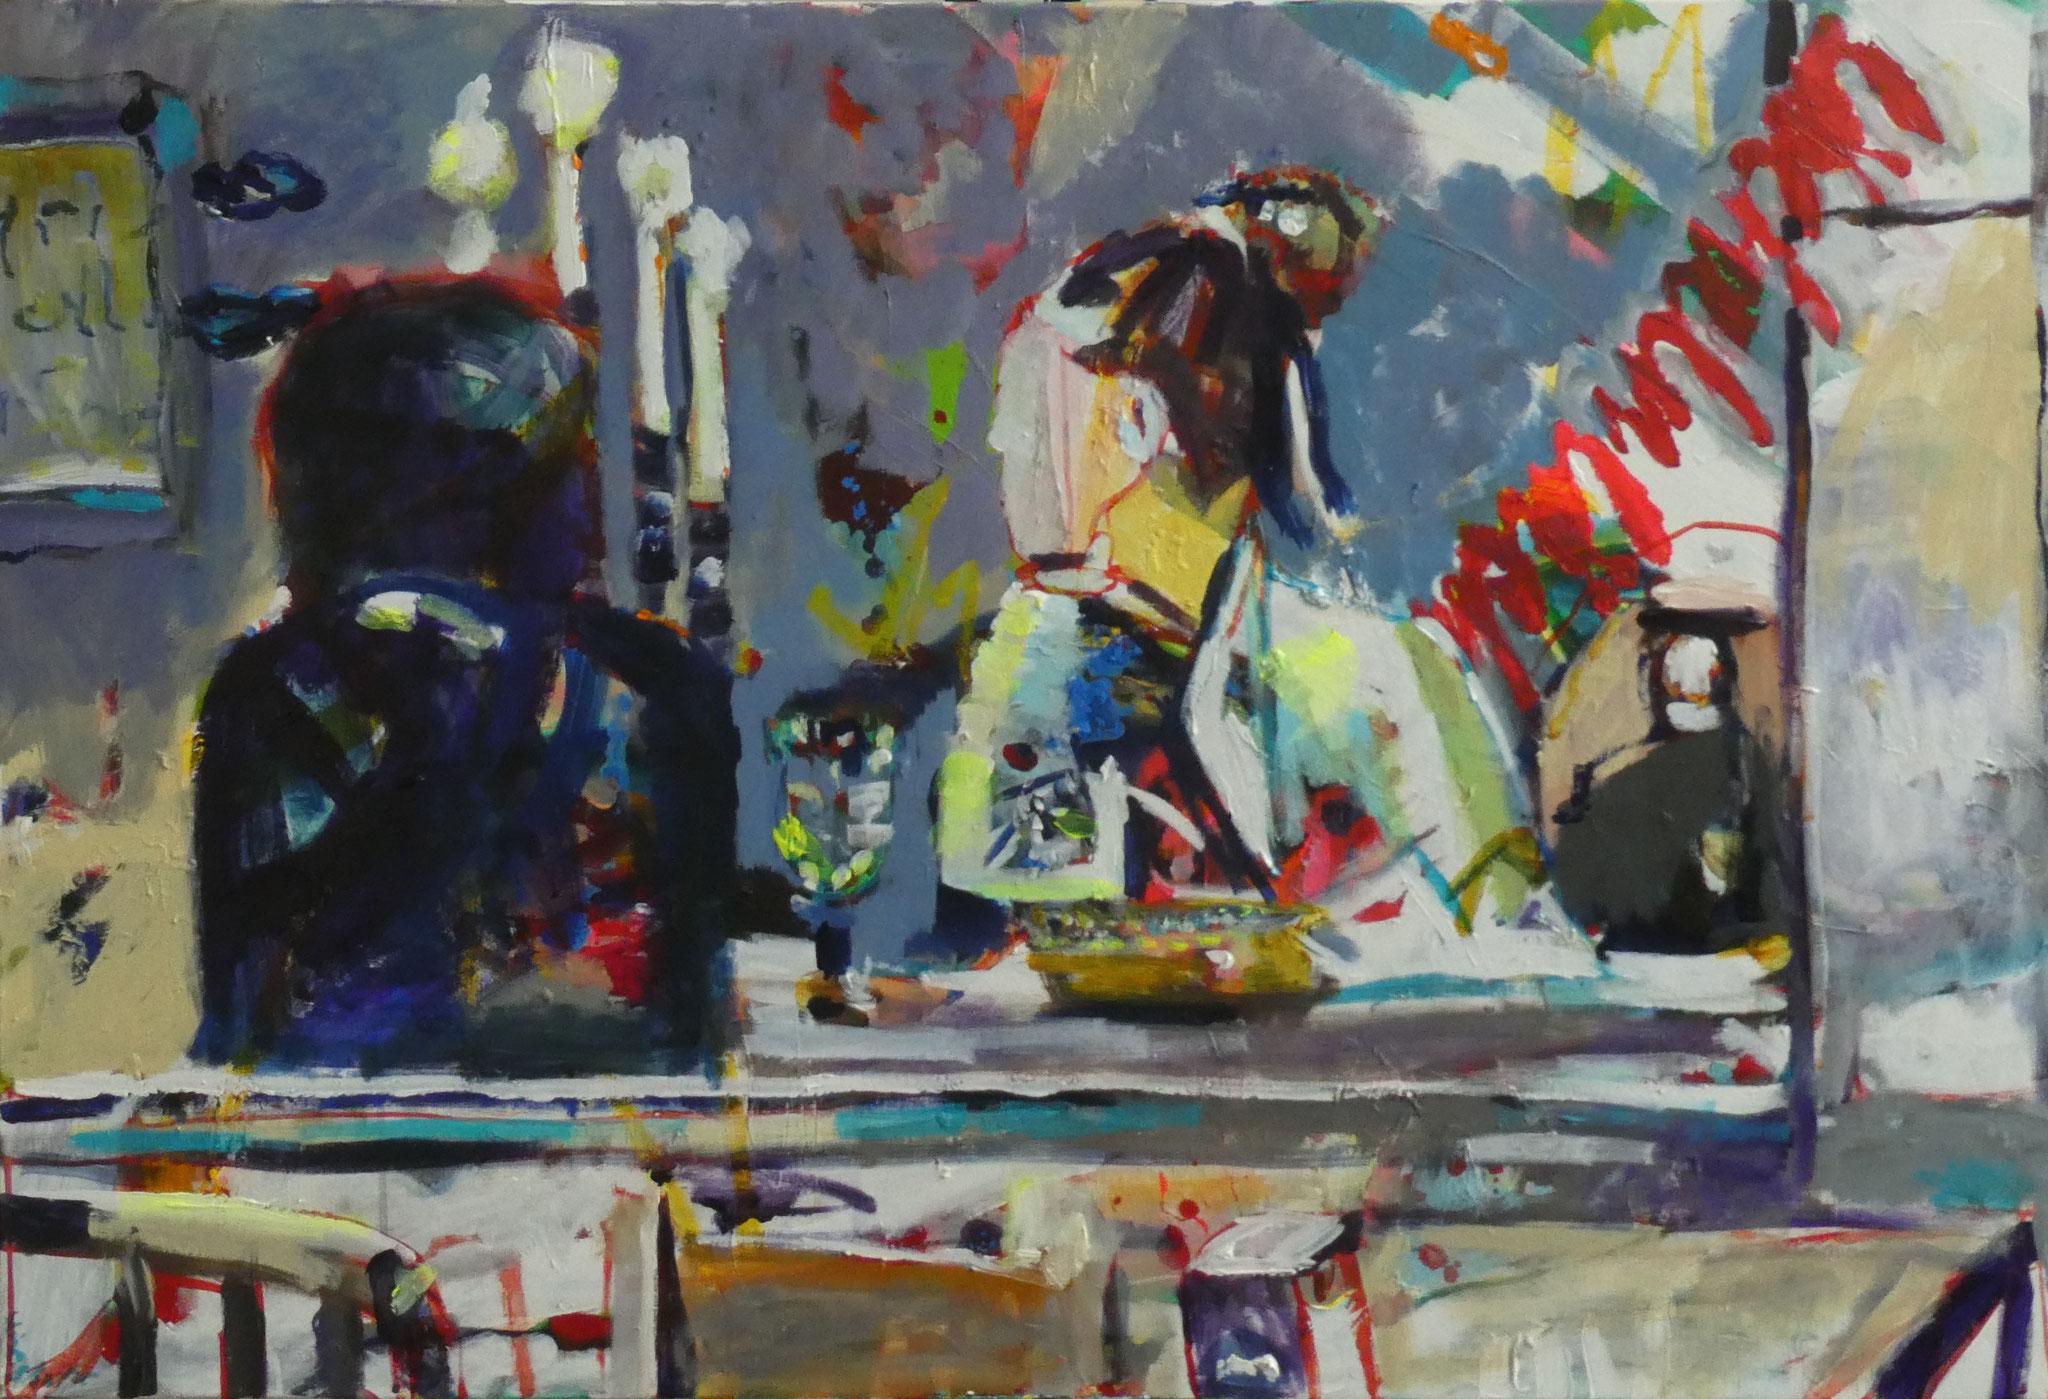 Auge in Auge: Venedig 2, 80x120, acrylic on canvas